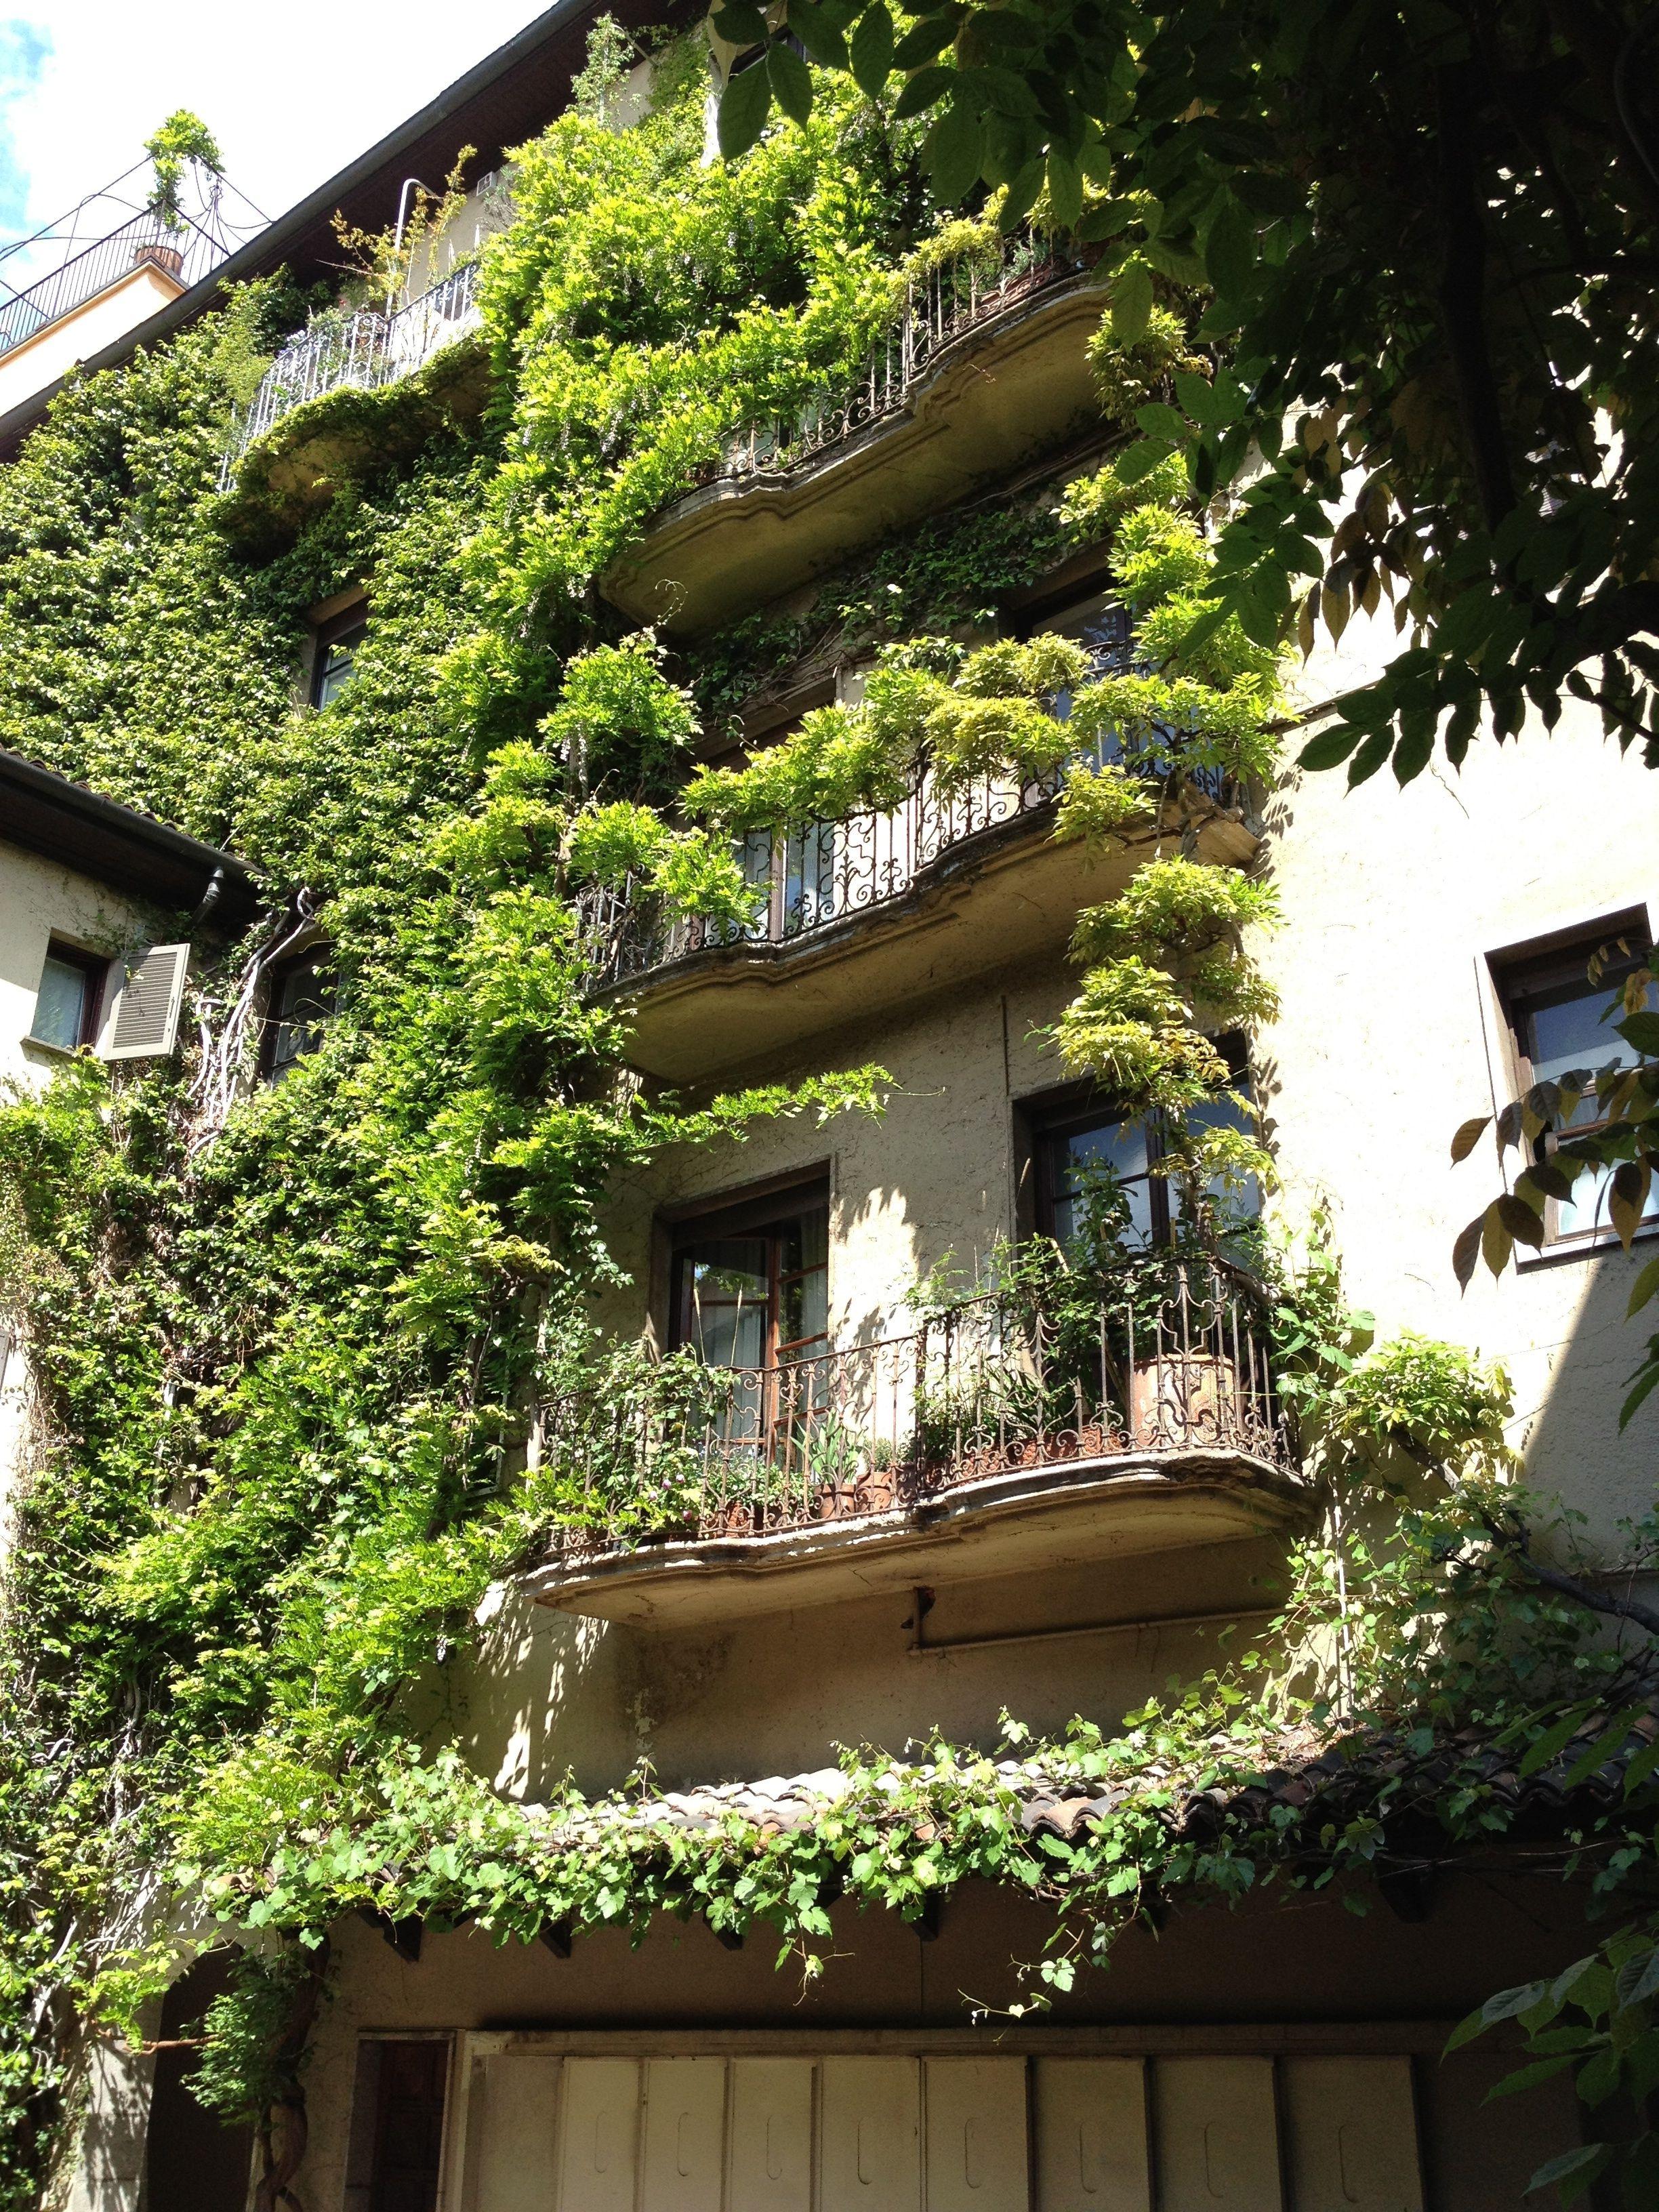 Casa degli Atellani - Milan